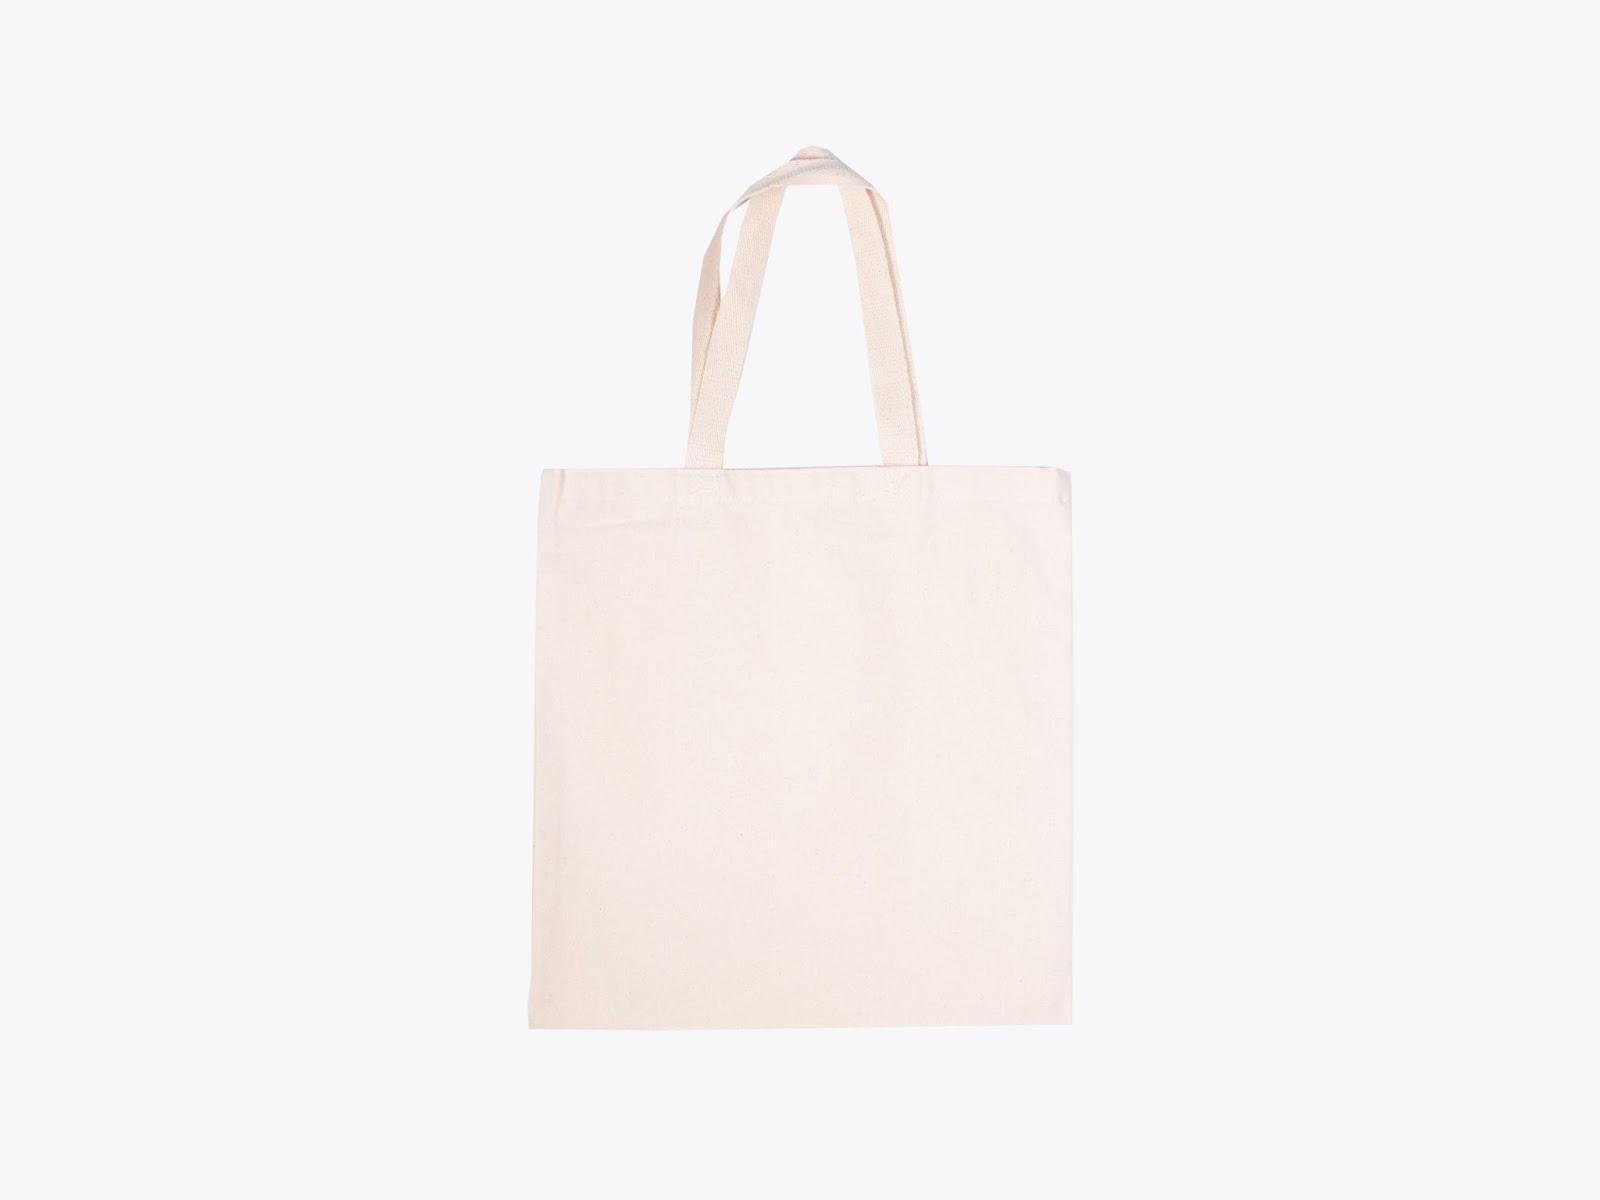 Q-Tees Q800 Promotional White Tote Bag